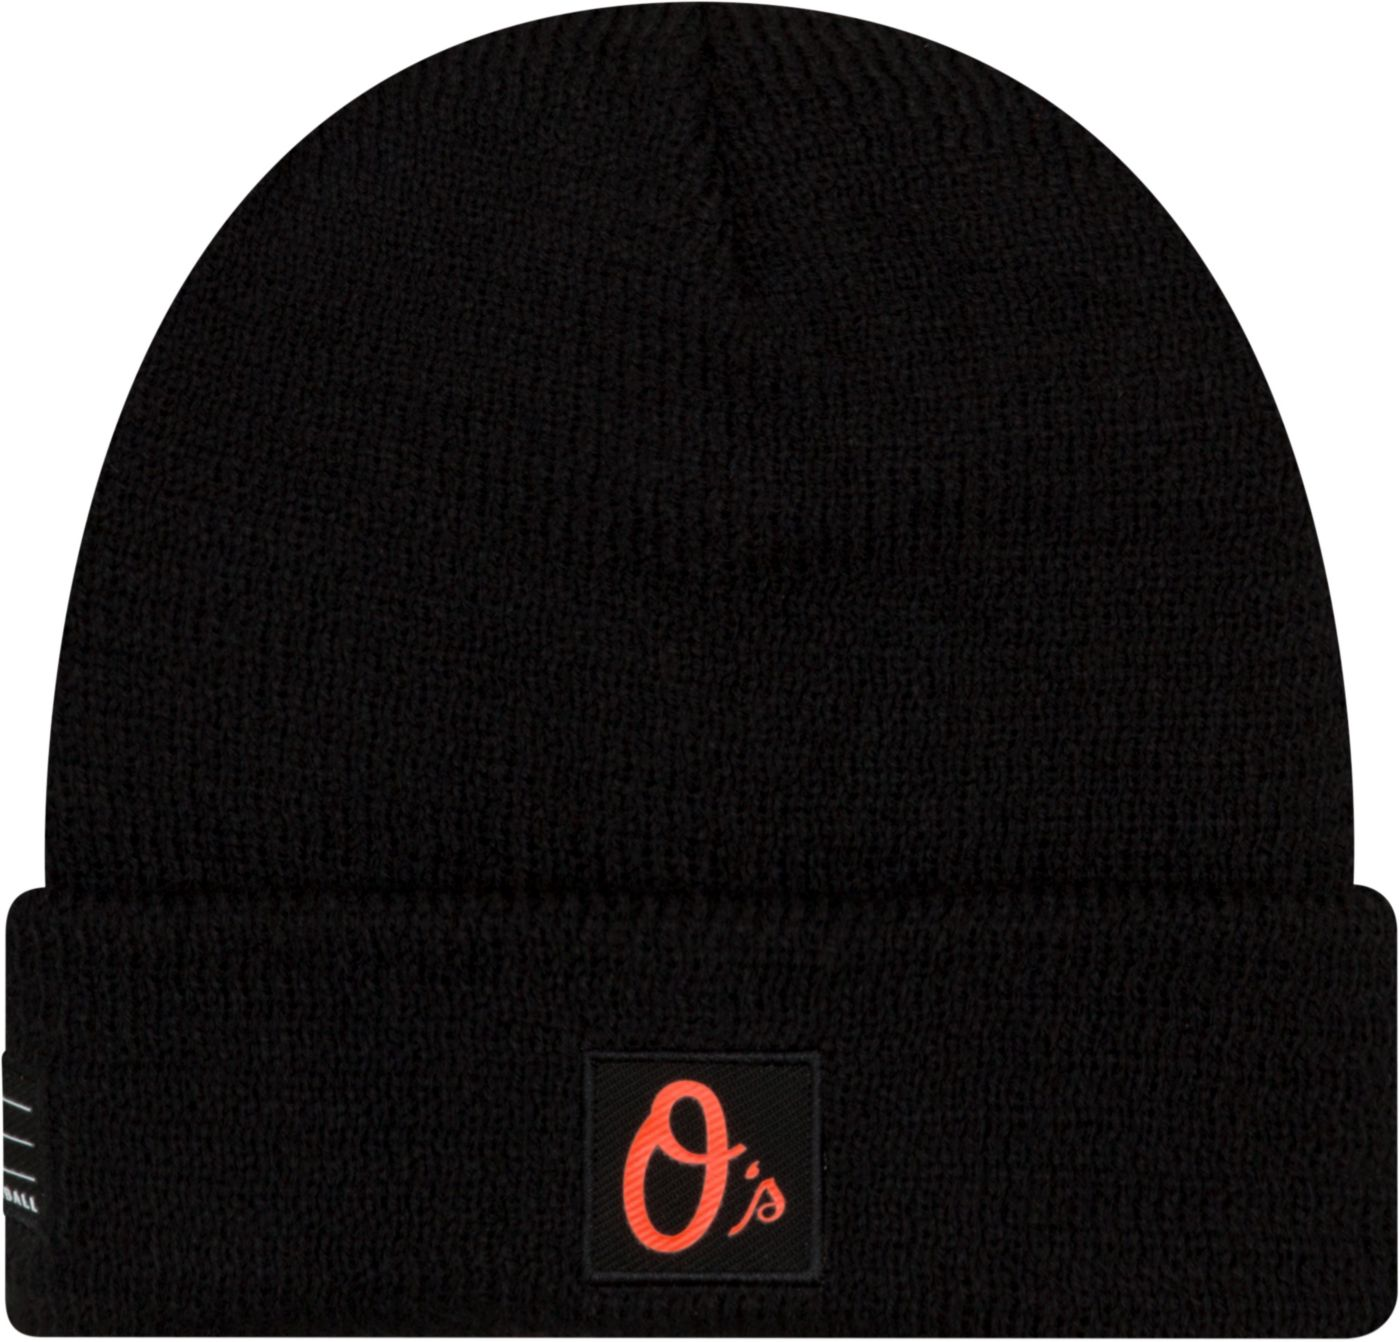 New Era Men's Baltimore Orioles Clubhouse Knit Hat